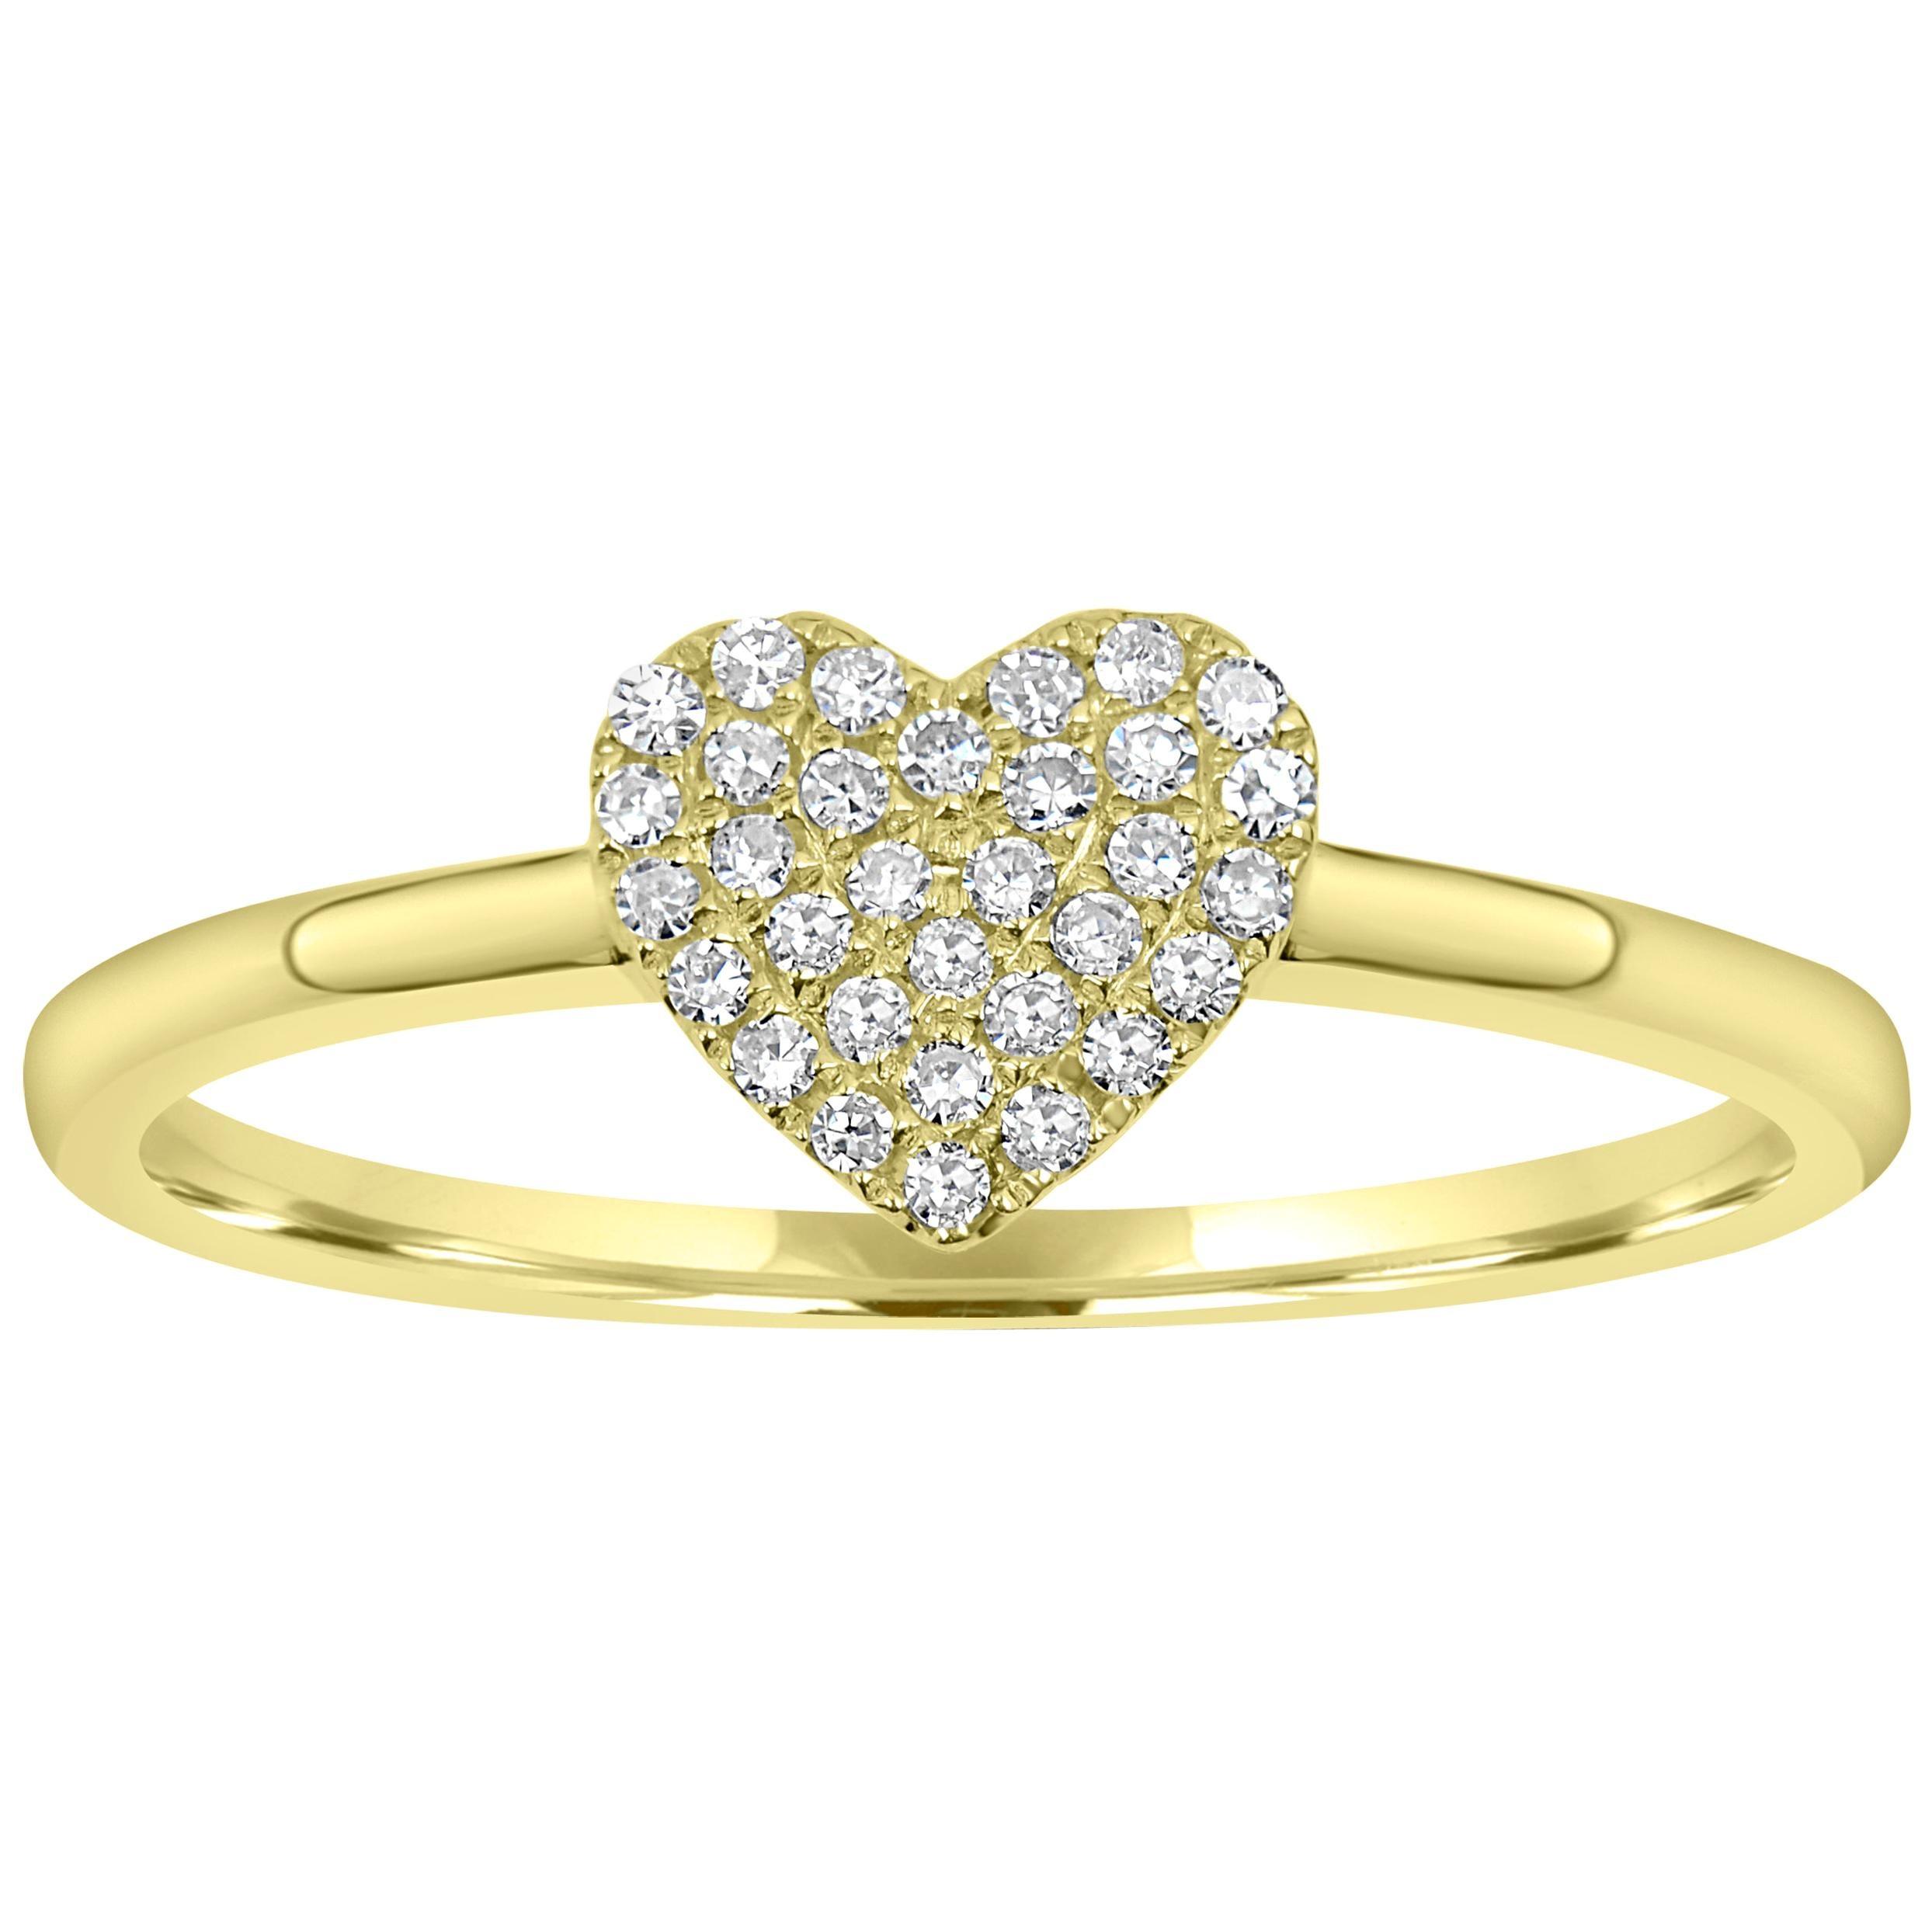 Pave Diamond Heart Ring in 18 Karat Yellow Gold